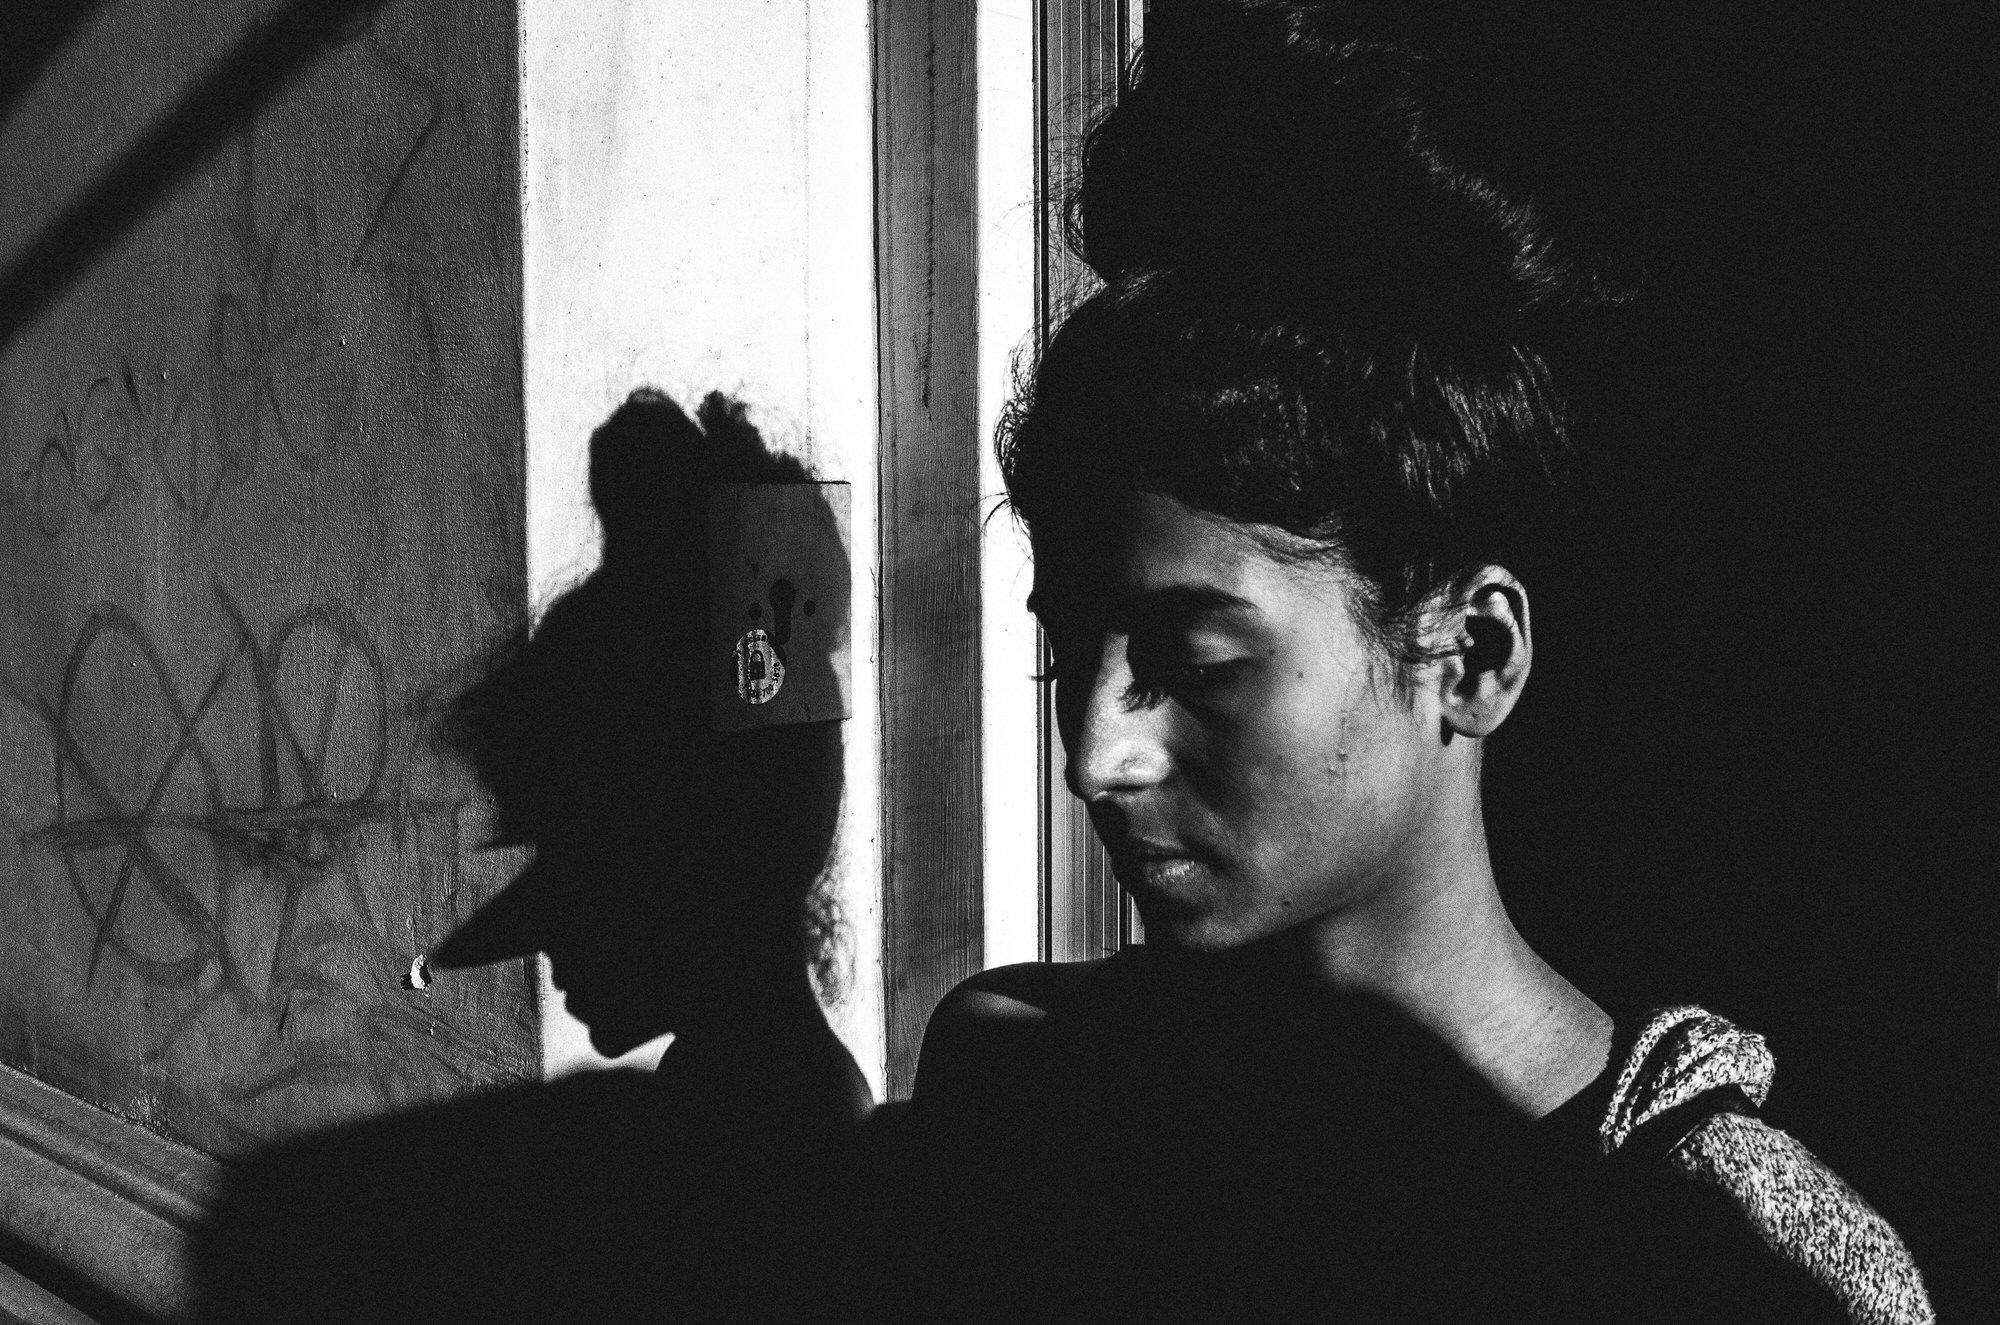 eric kim photography black and white - 16214812012_2f18ebfbd6_o